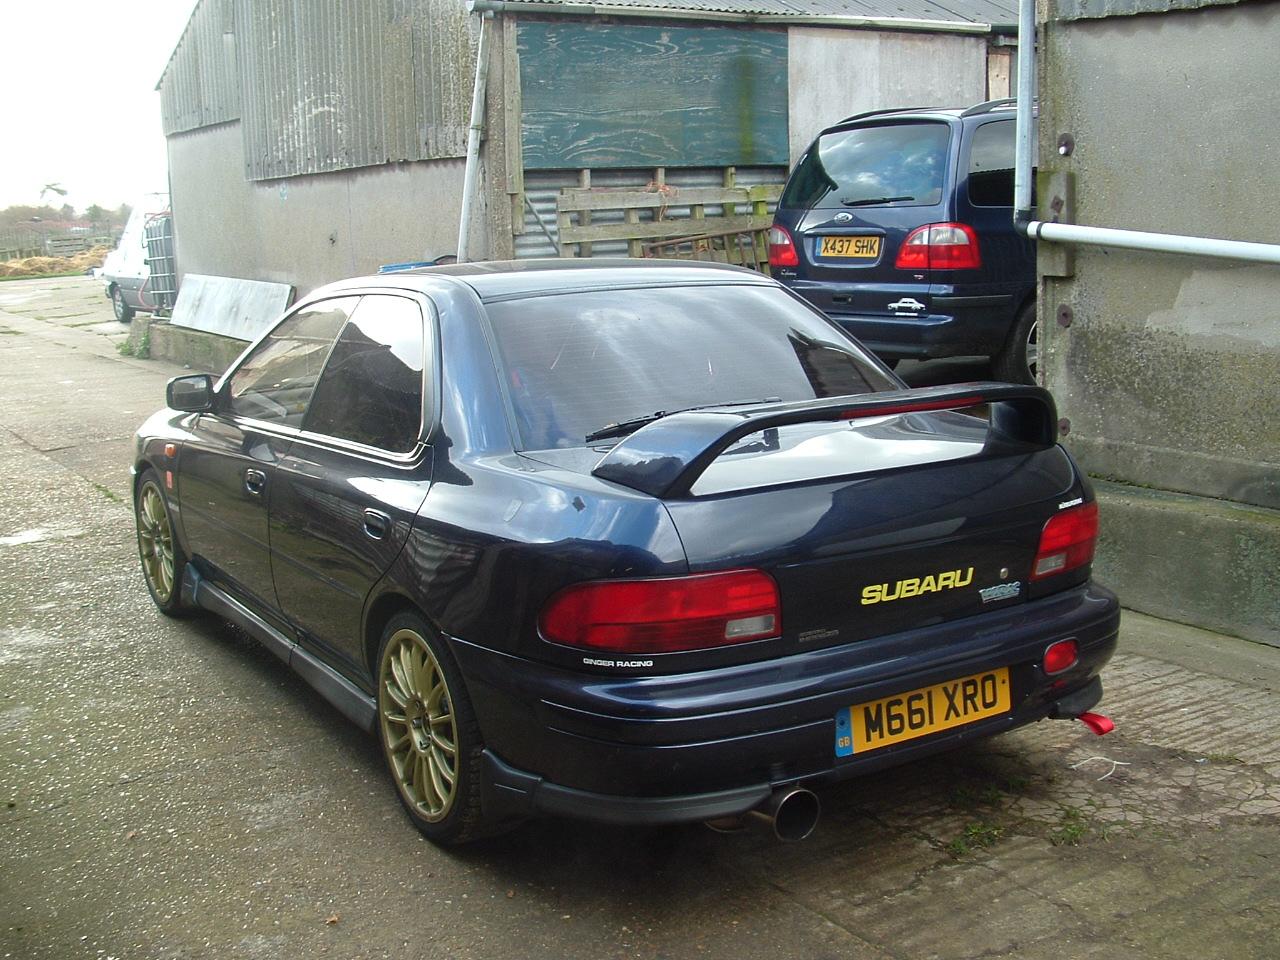 Sti For Sale >> Subaru Impreza WRX 1995 (SOLD)